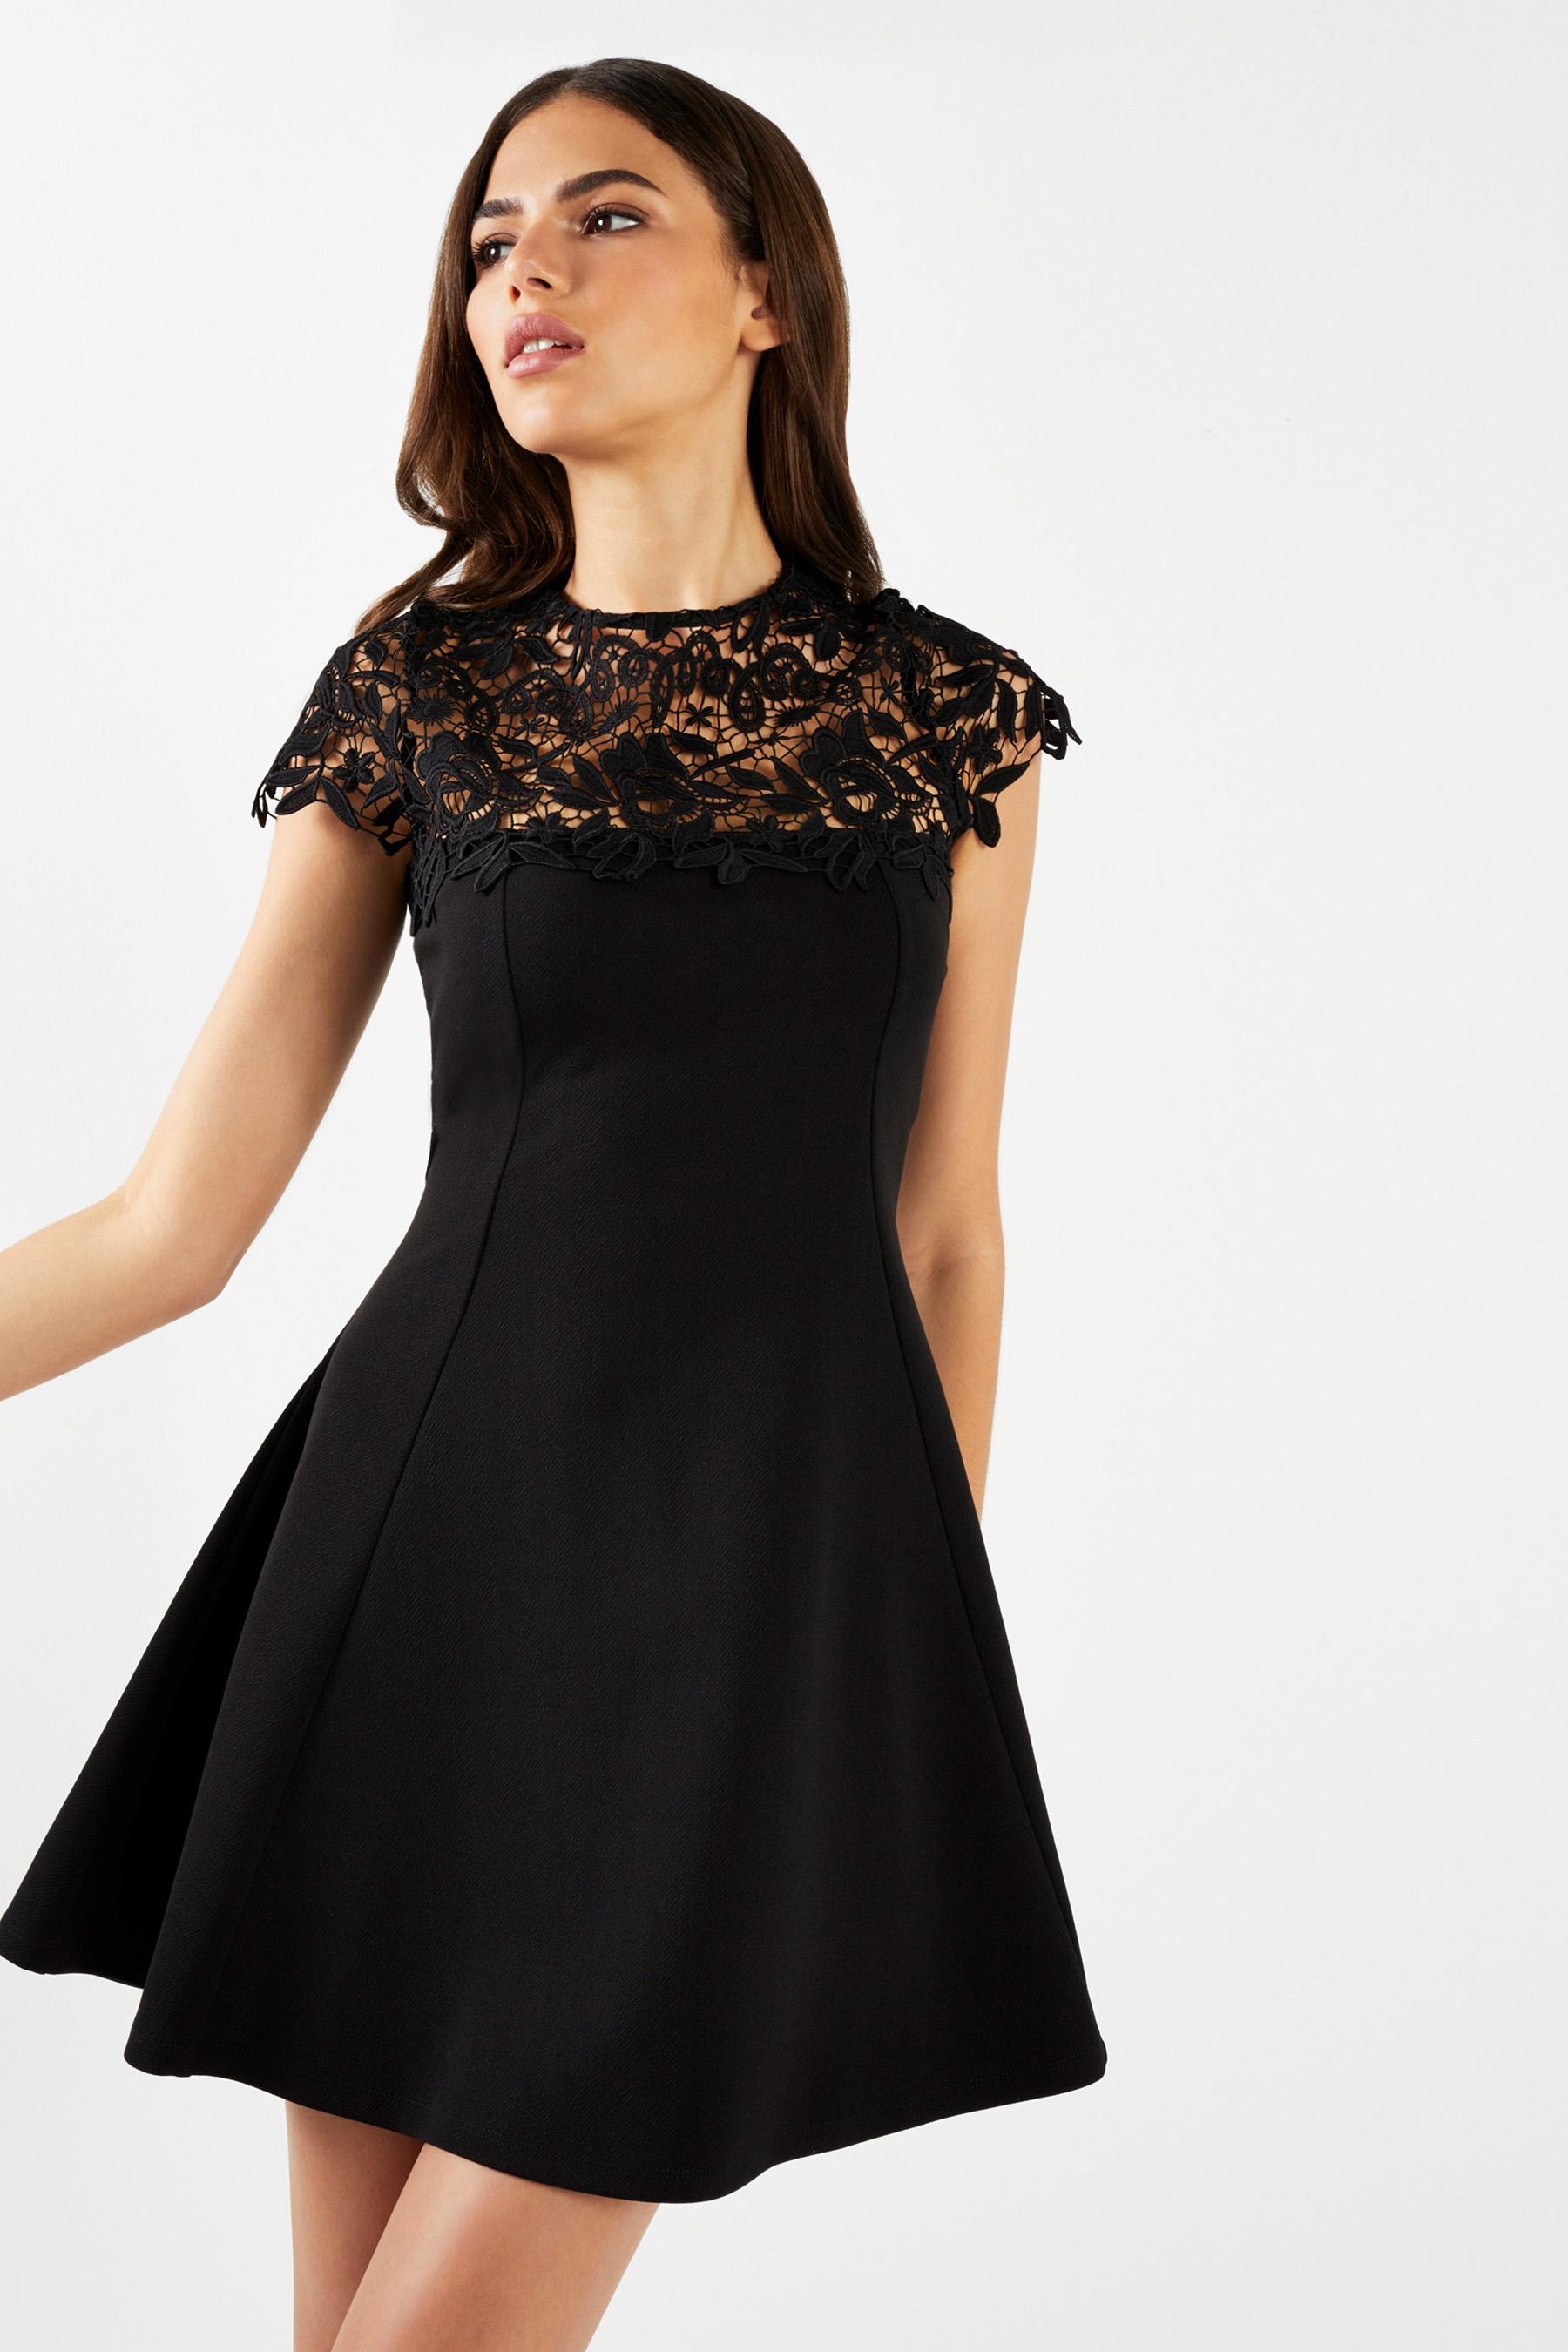 76ffe6b46a Womens Lipsy Lace Top Skater Dress - Black